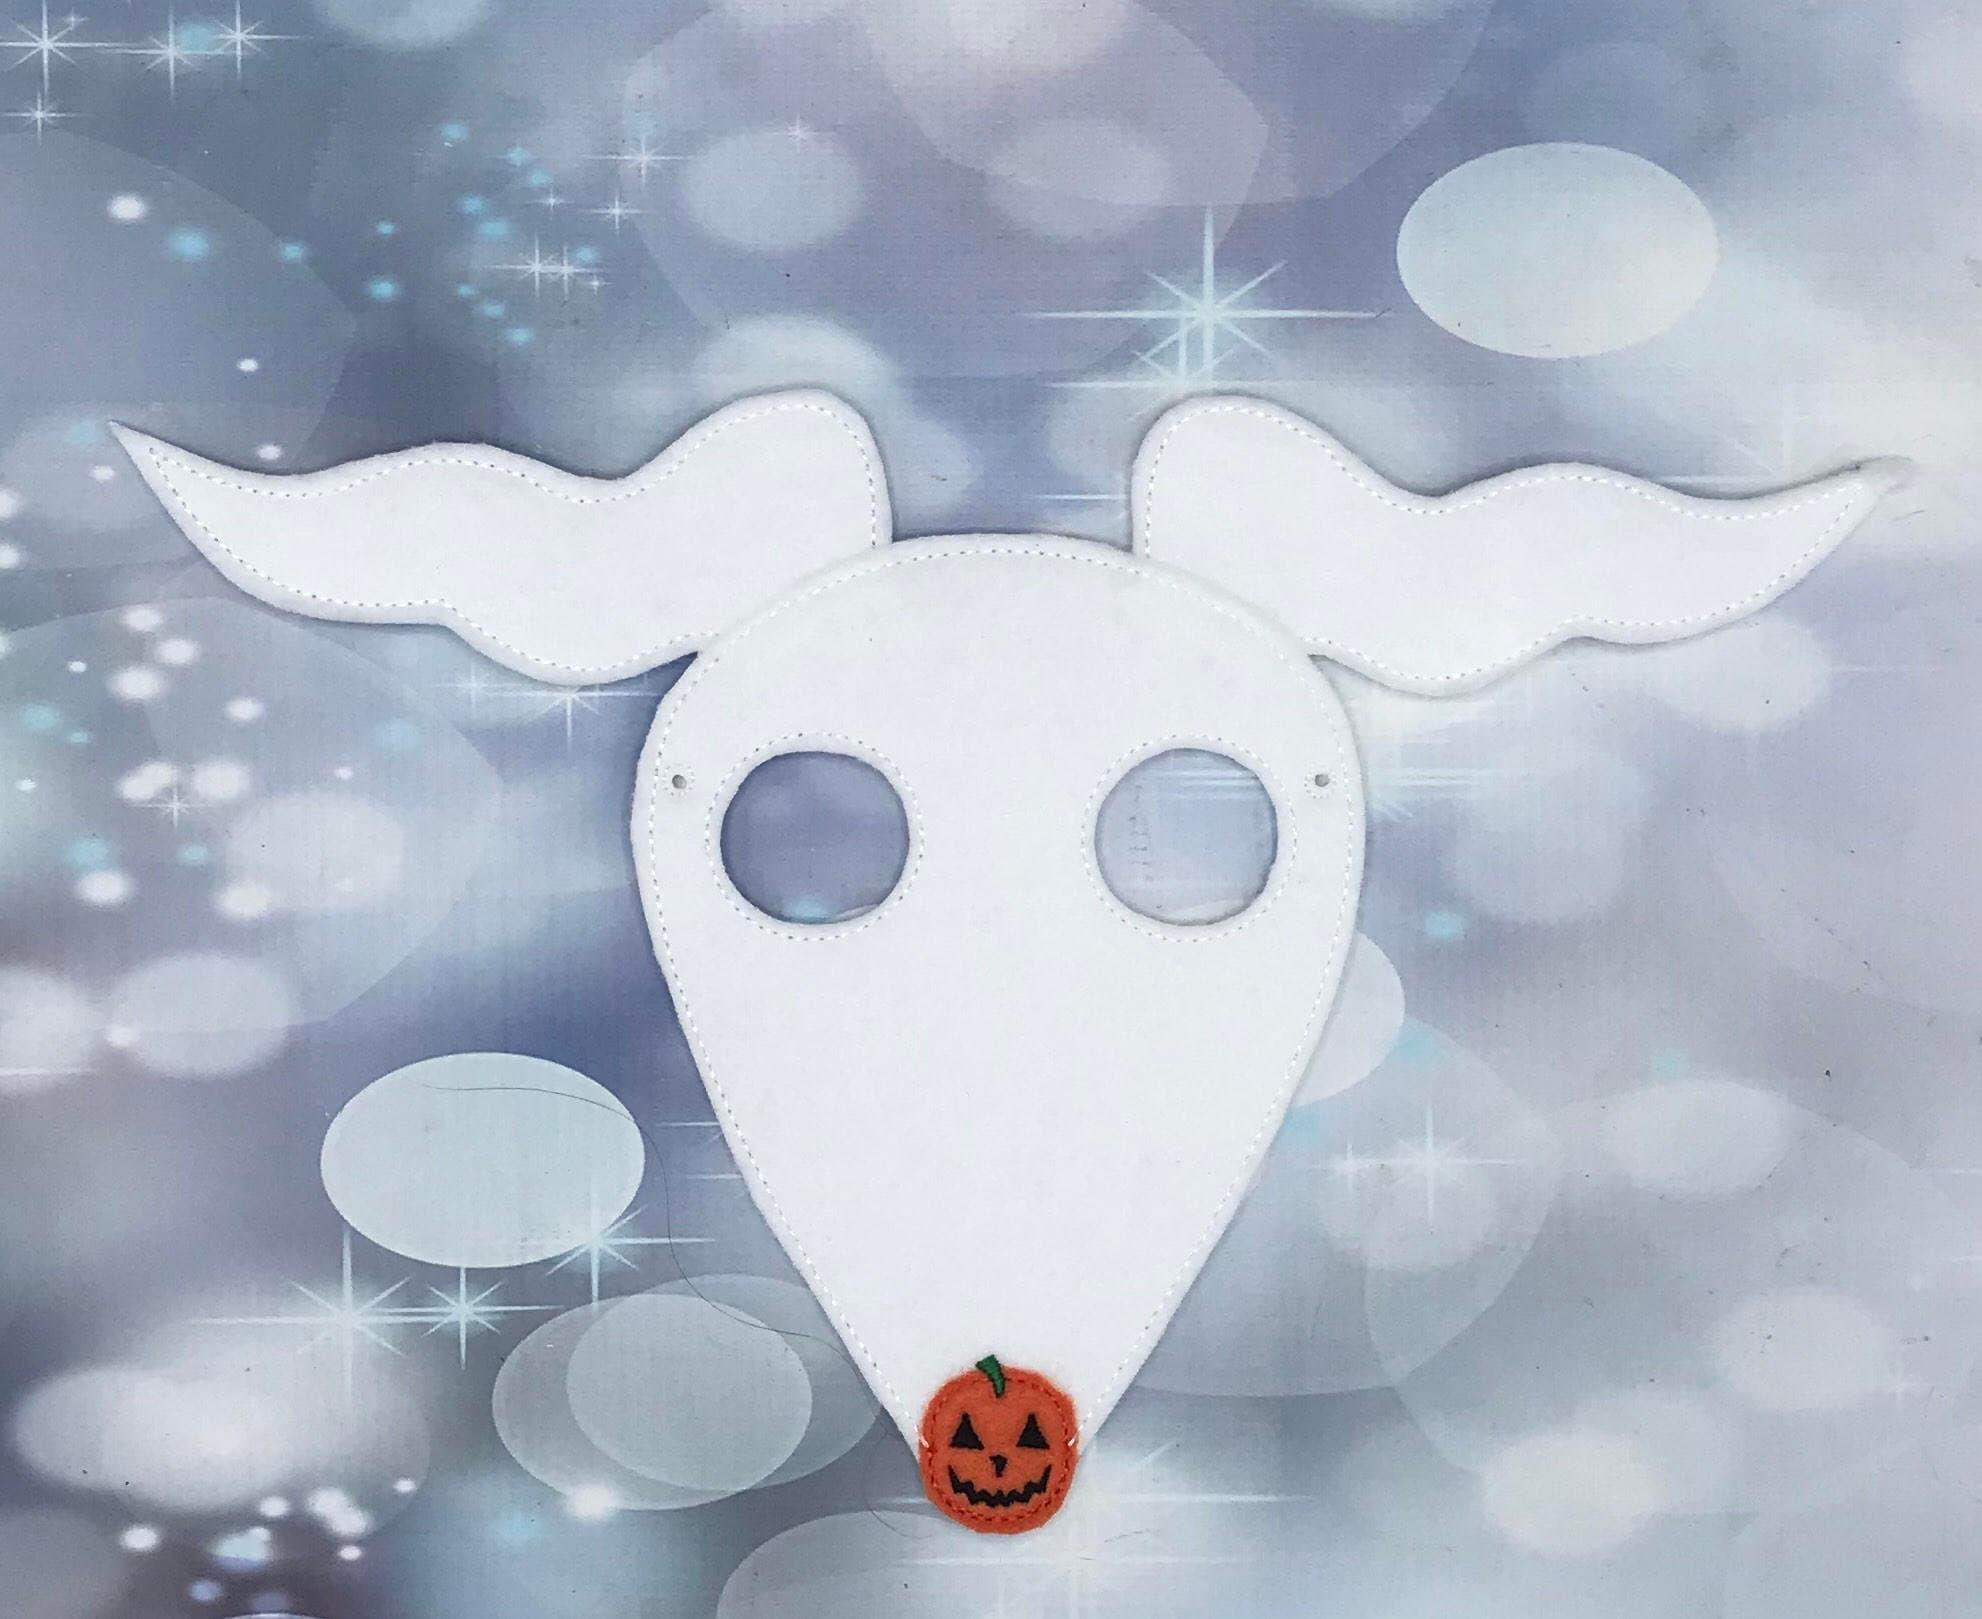 Zero Nightmare before Christmas Ghost Dog Dress Up Masks | Etsy